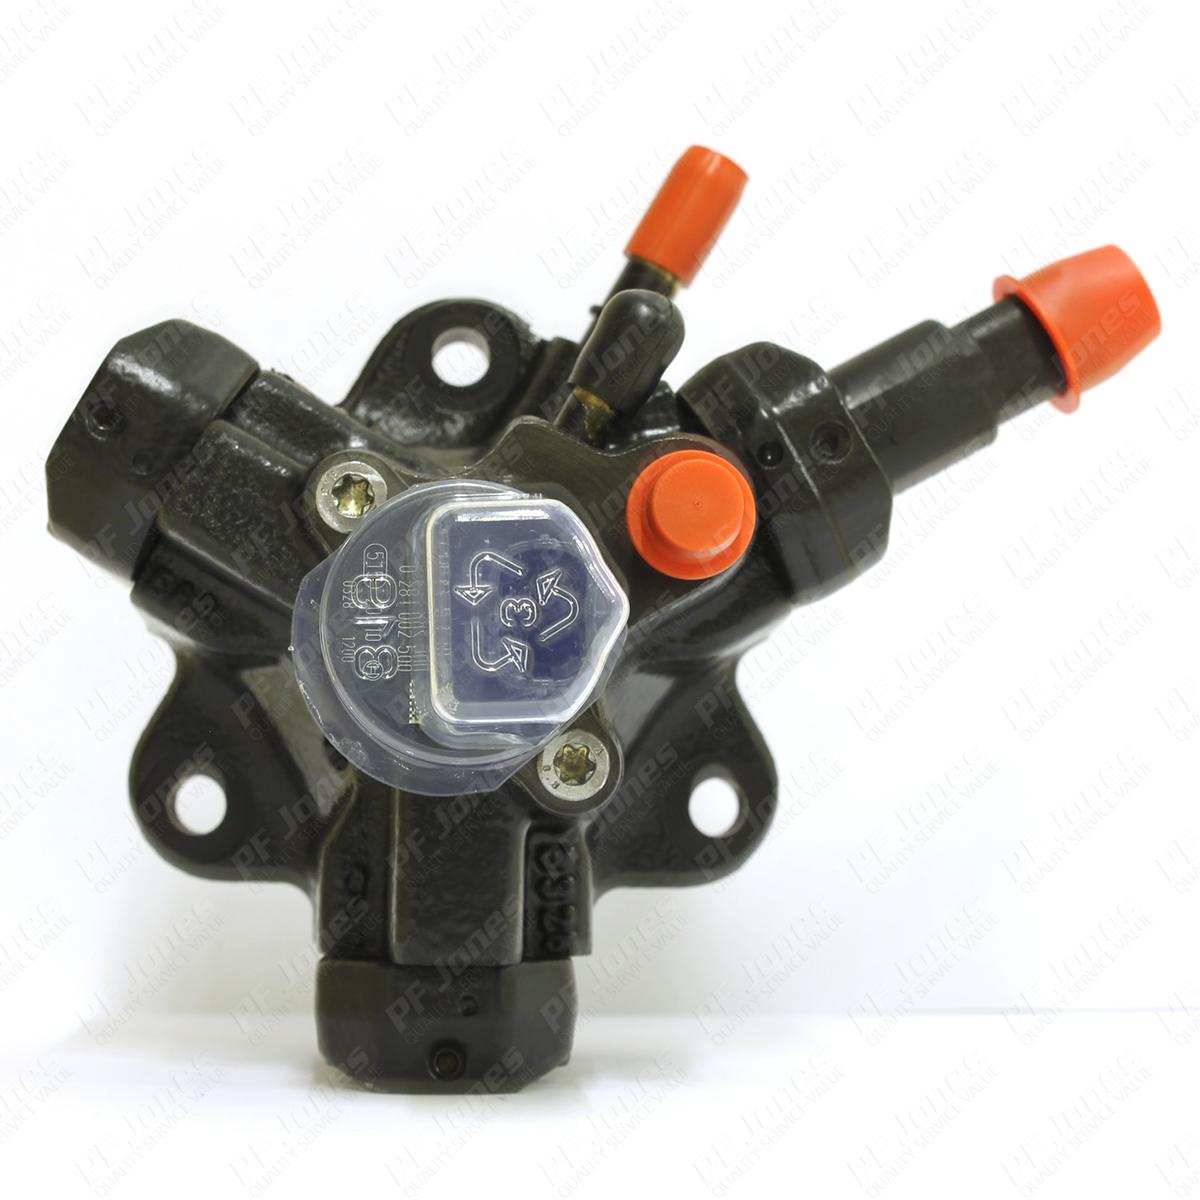 Fiat Ducato 2.8 JTD 2000-2006 New Bosch Diesel Fuel Pump 0445020002